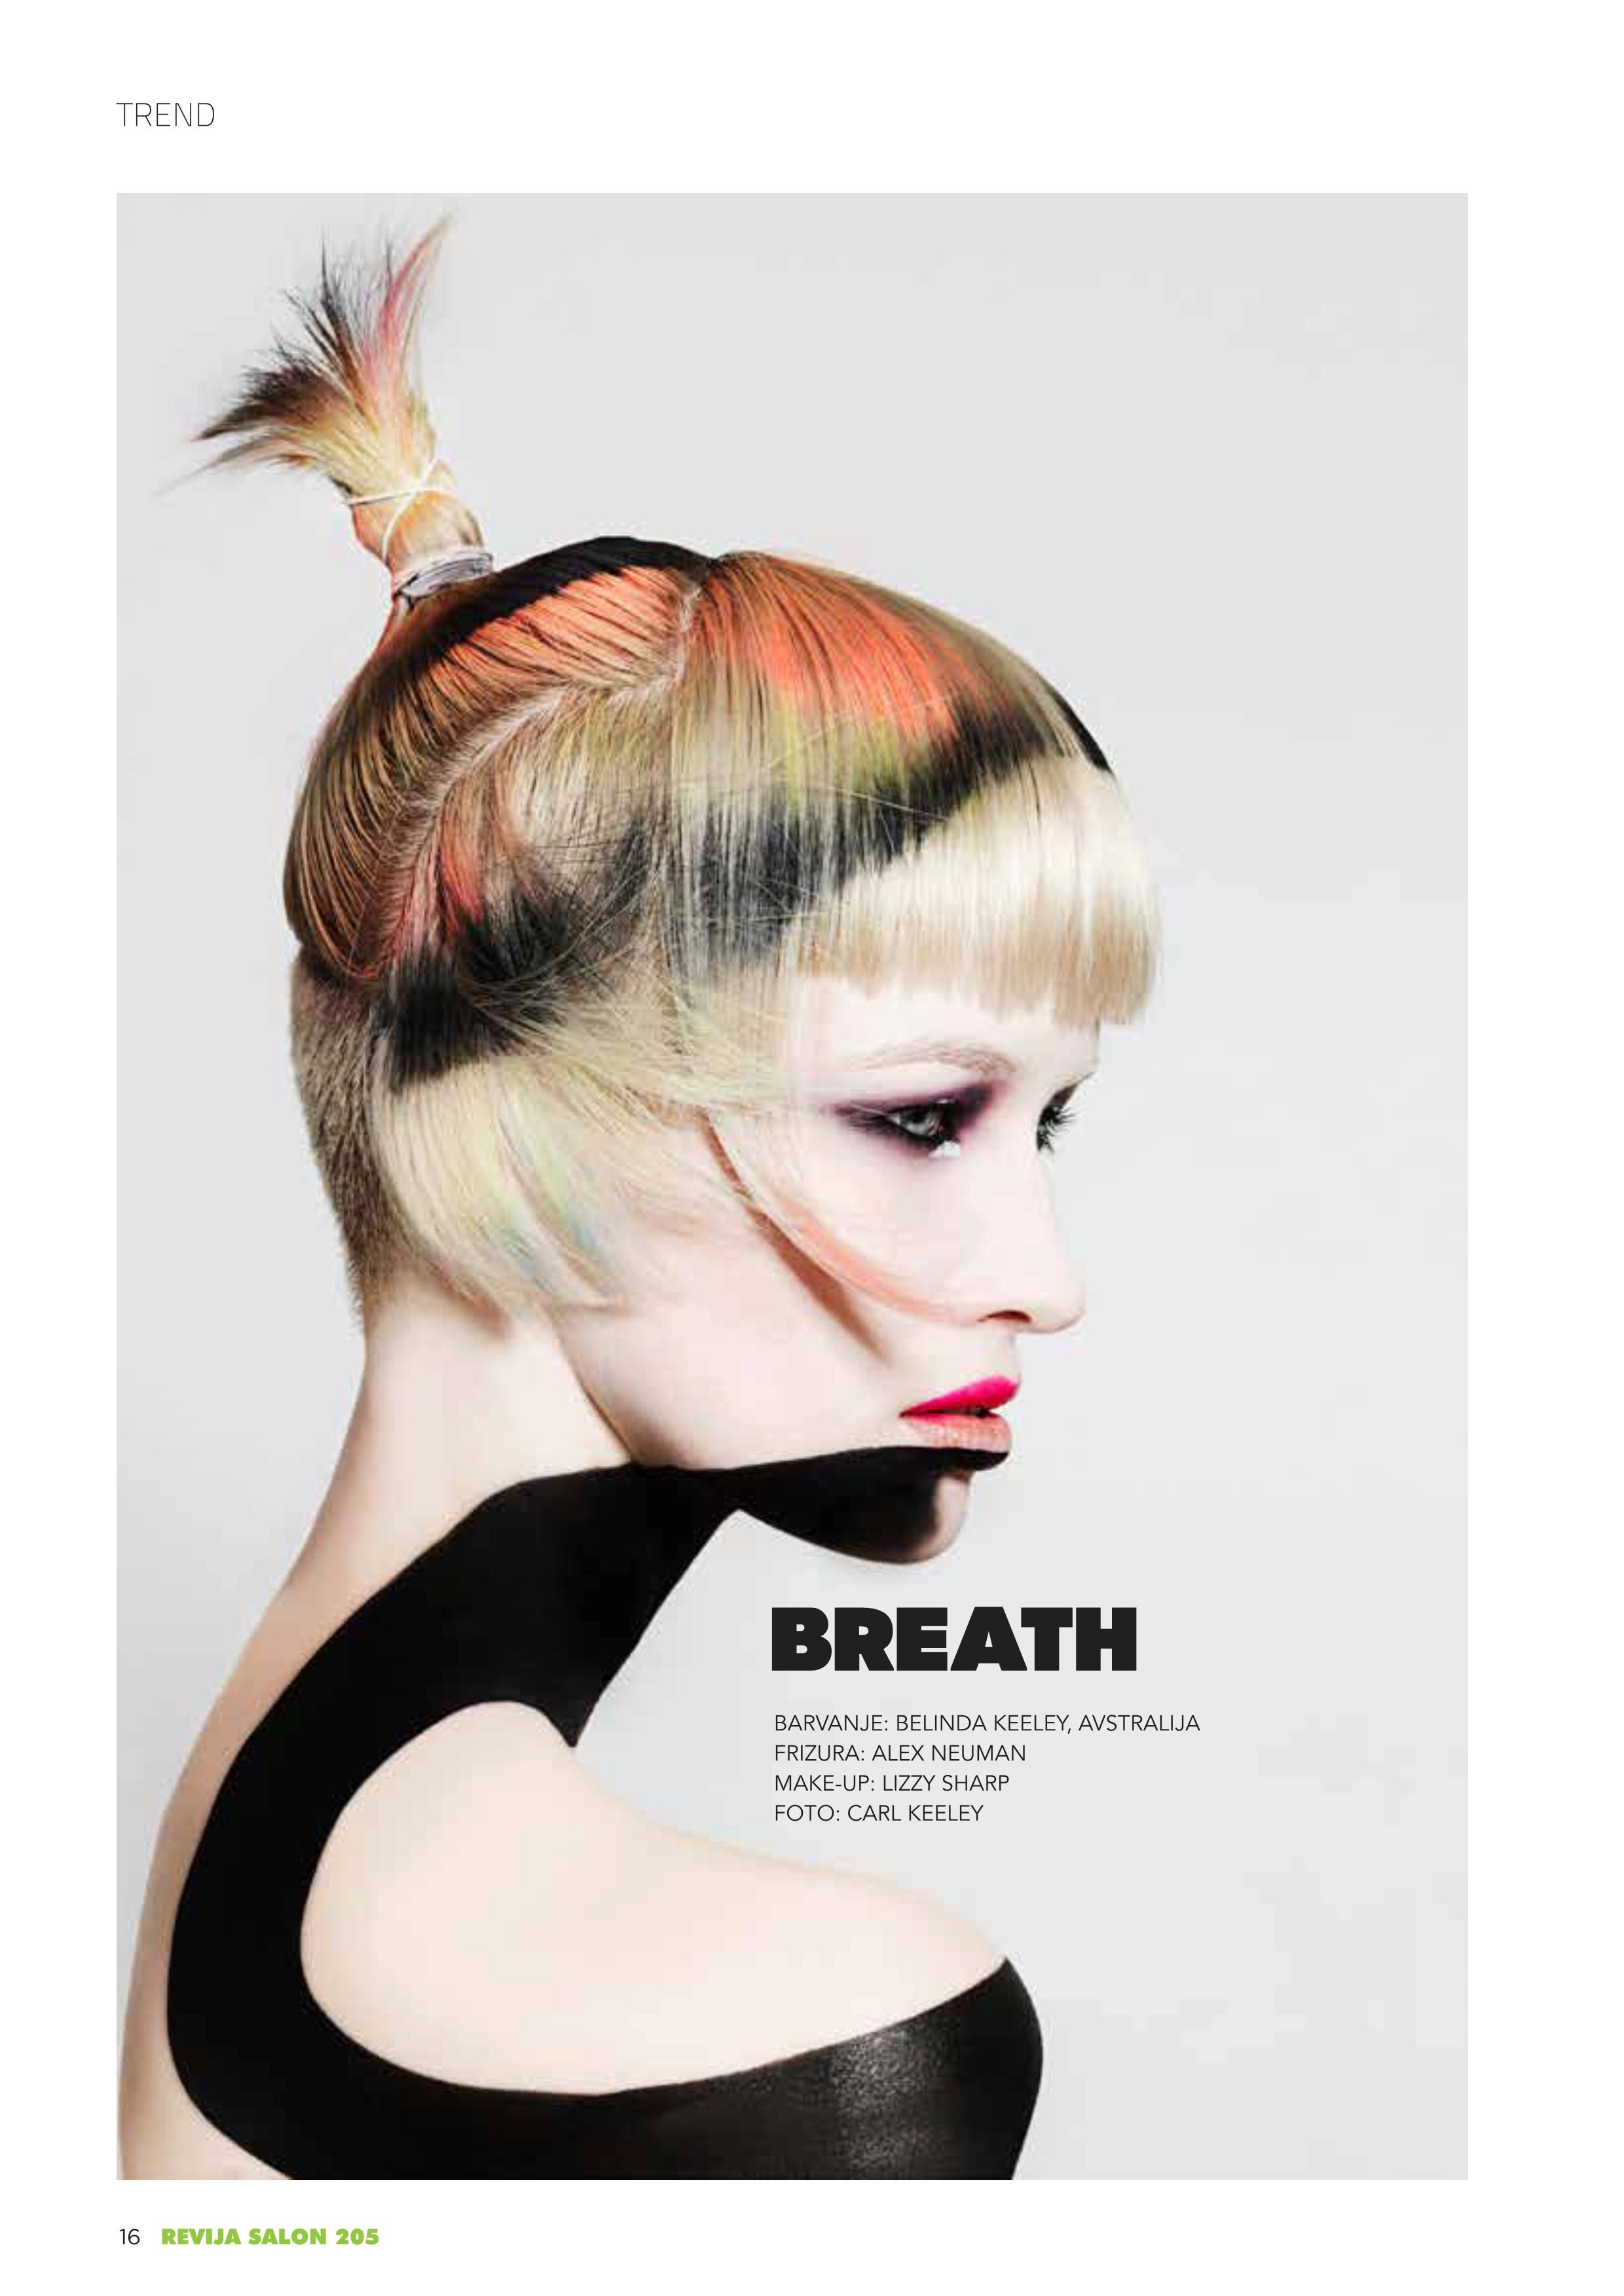 Chumba_BKeeley_Breath_1.jpg